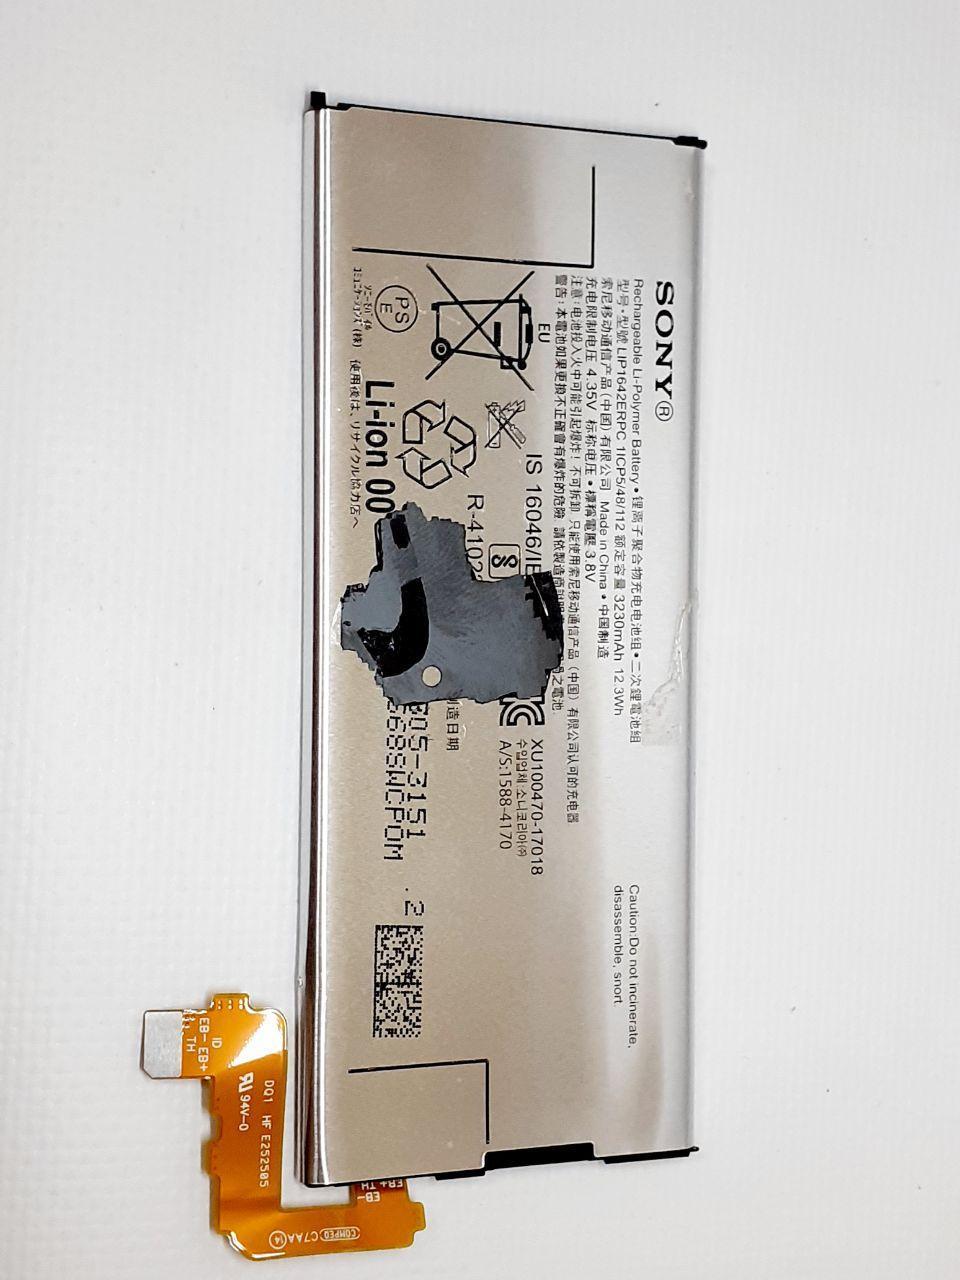 Аккумулятор SONY LIS1642ERPC G8141 XPERIA XZ PREMIUM/ G8142, 3230 mAh оригинал , сервисный